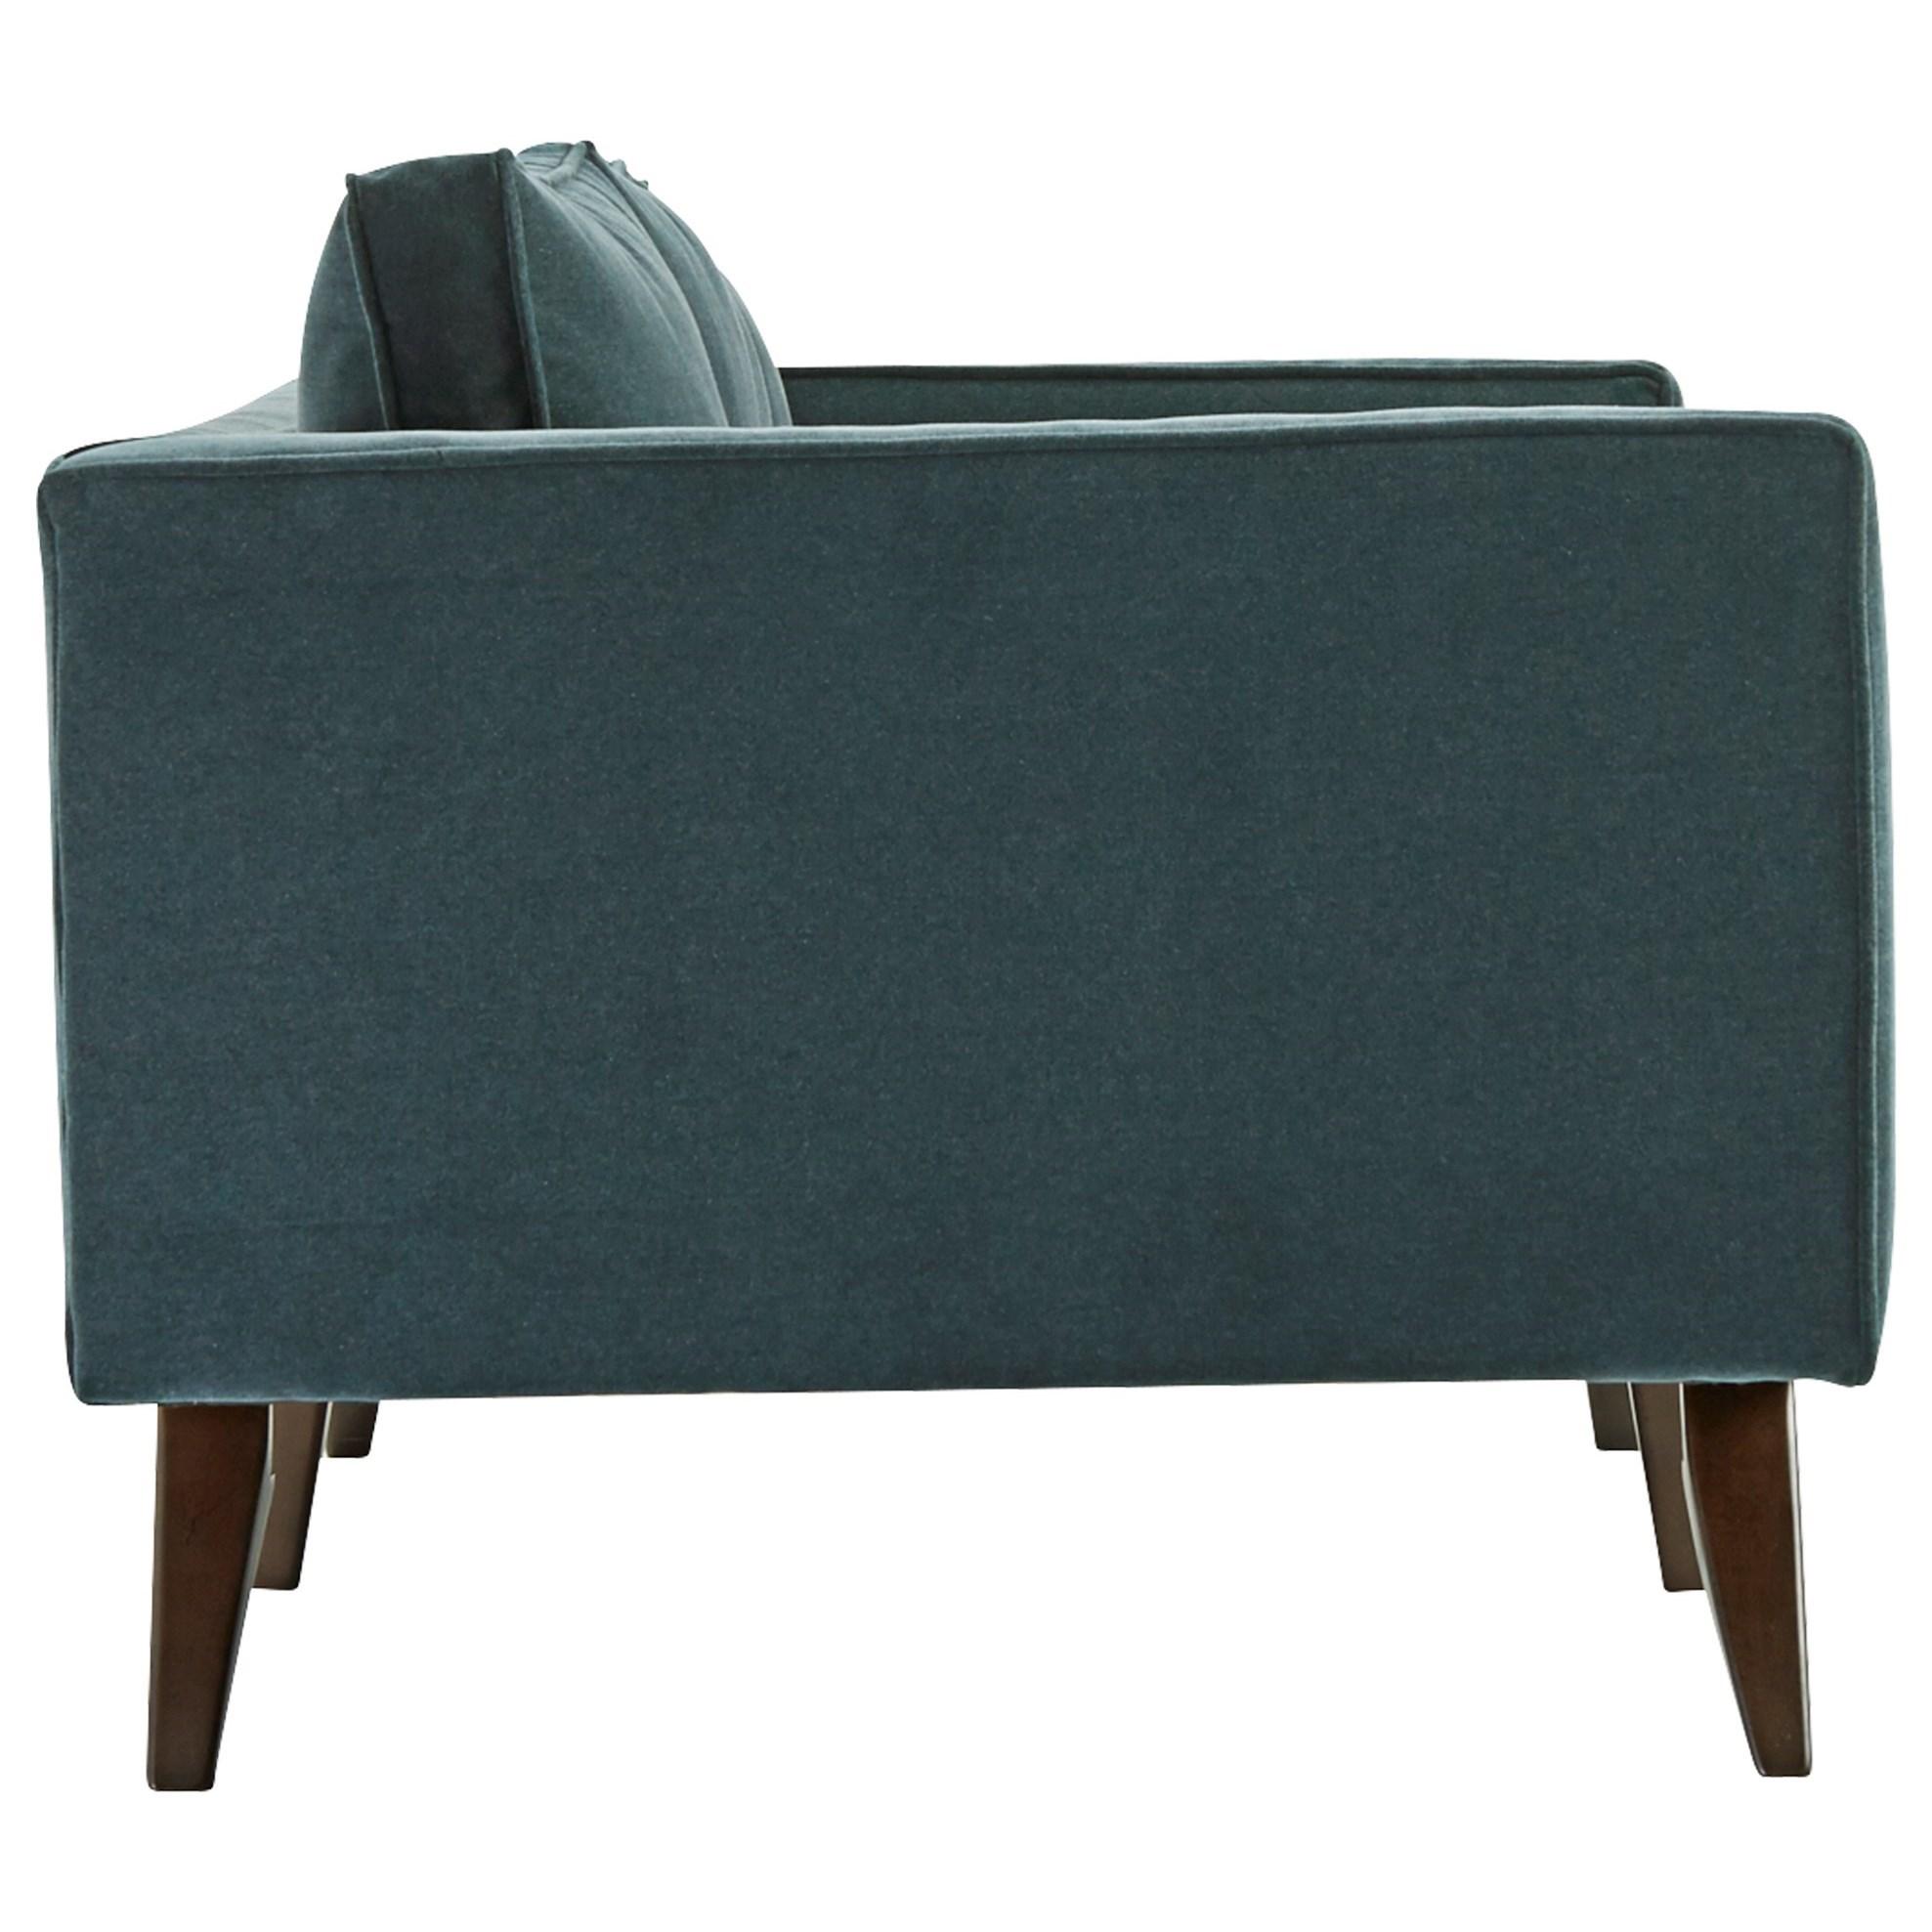 Direct Furniture Fairfax Va: Northeast Factory Direct - Cleveland